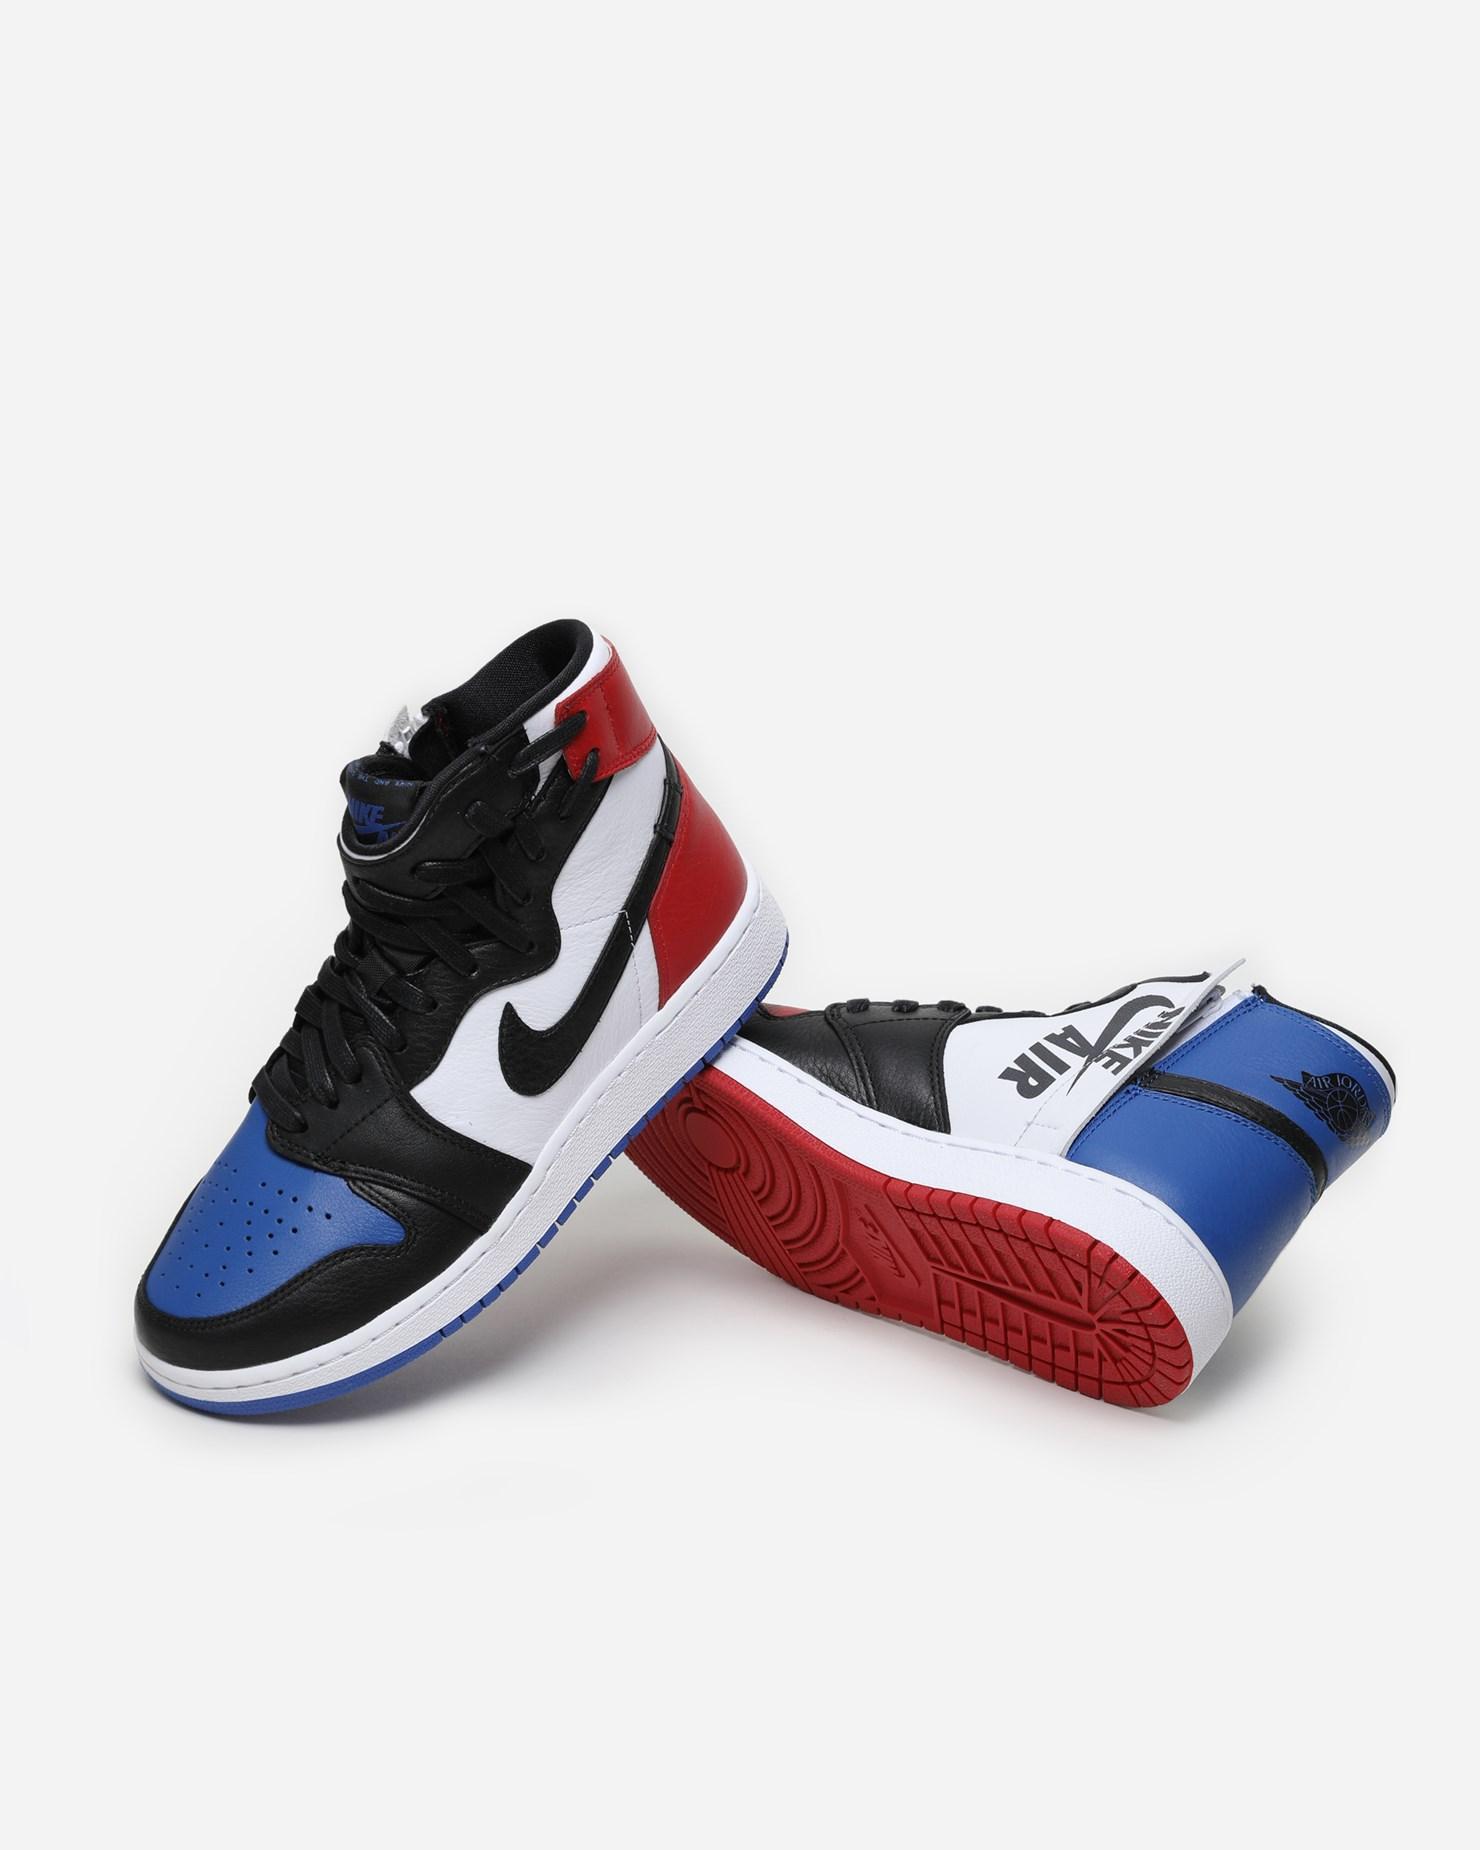 Jordan Brand Air Jordan 1 Rebel XX OG Black/Varsity Royal